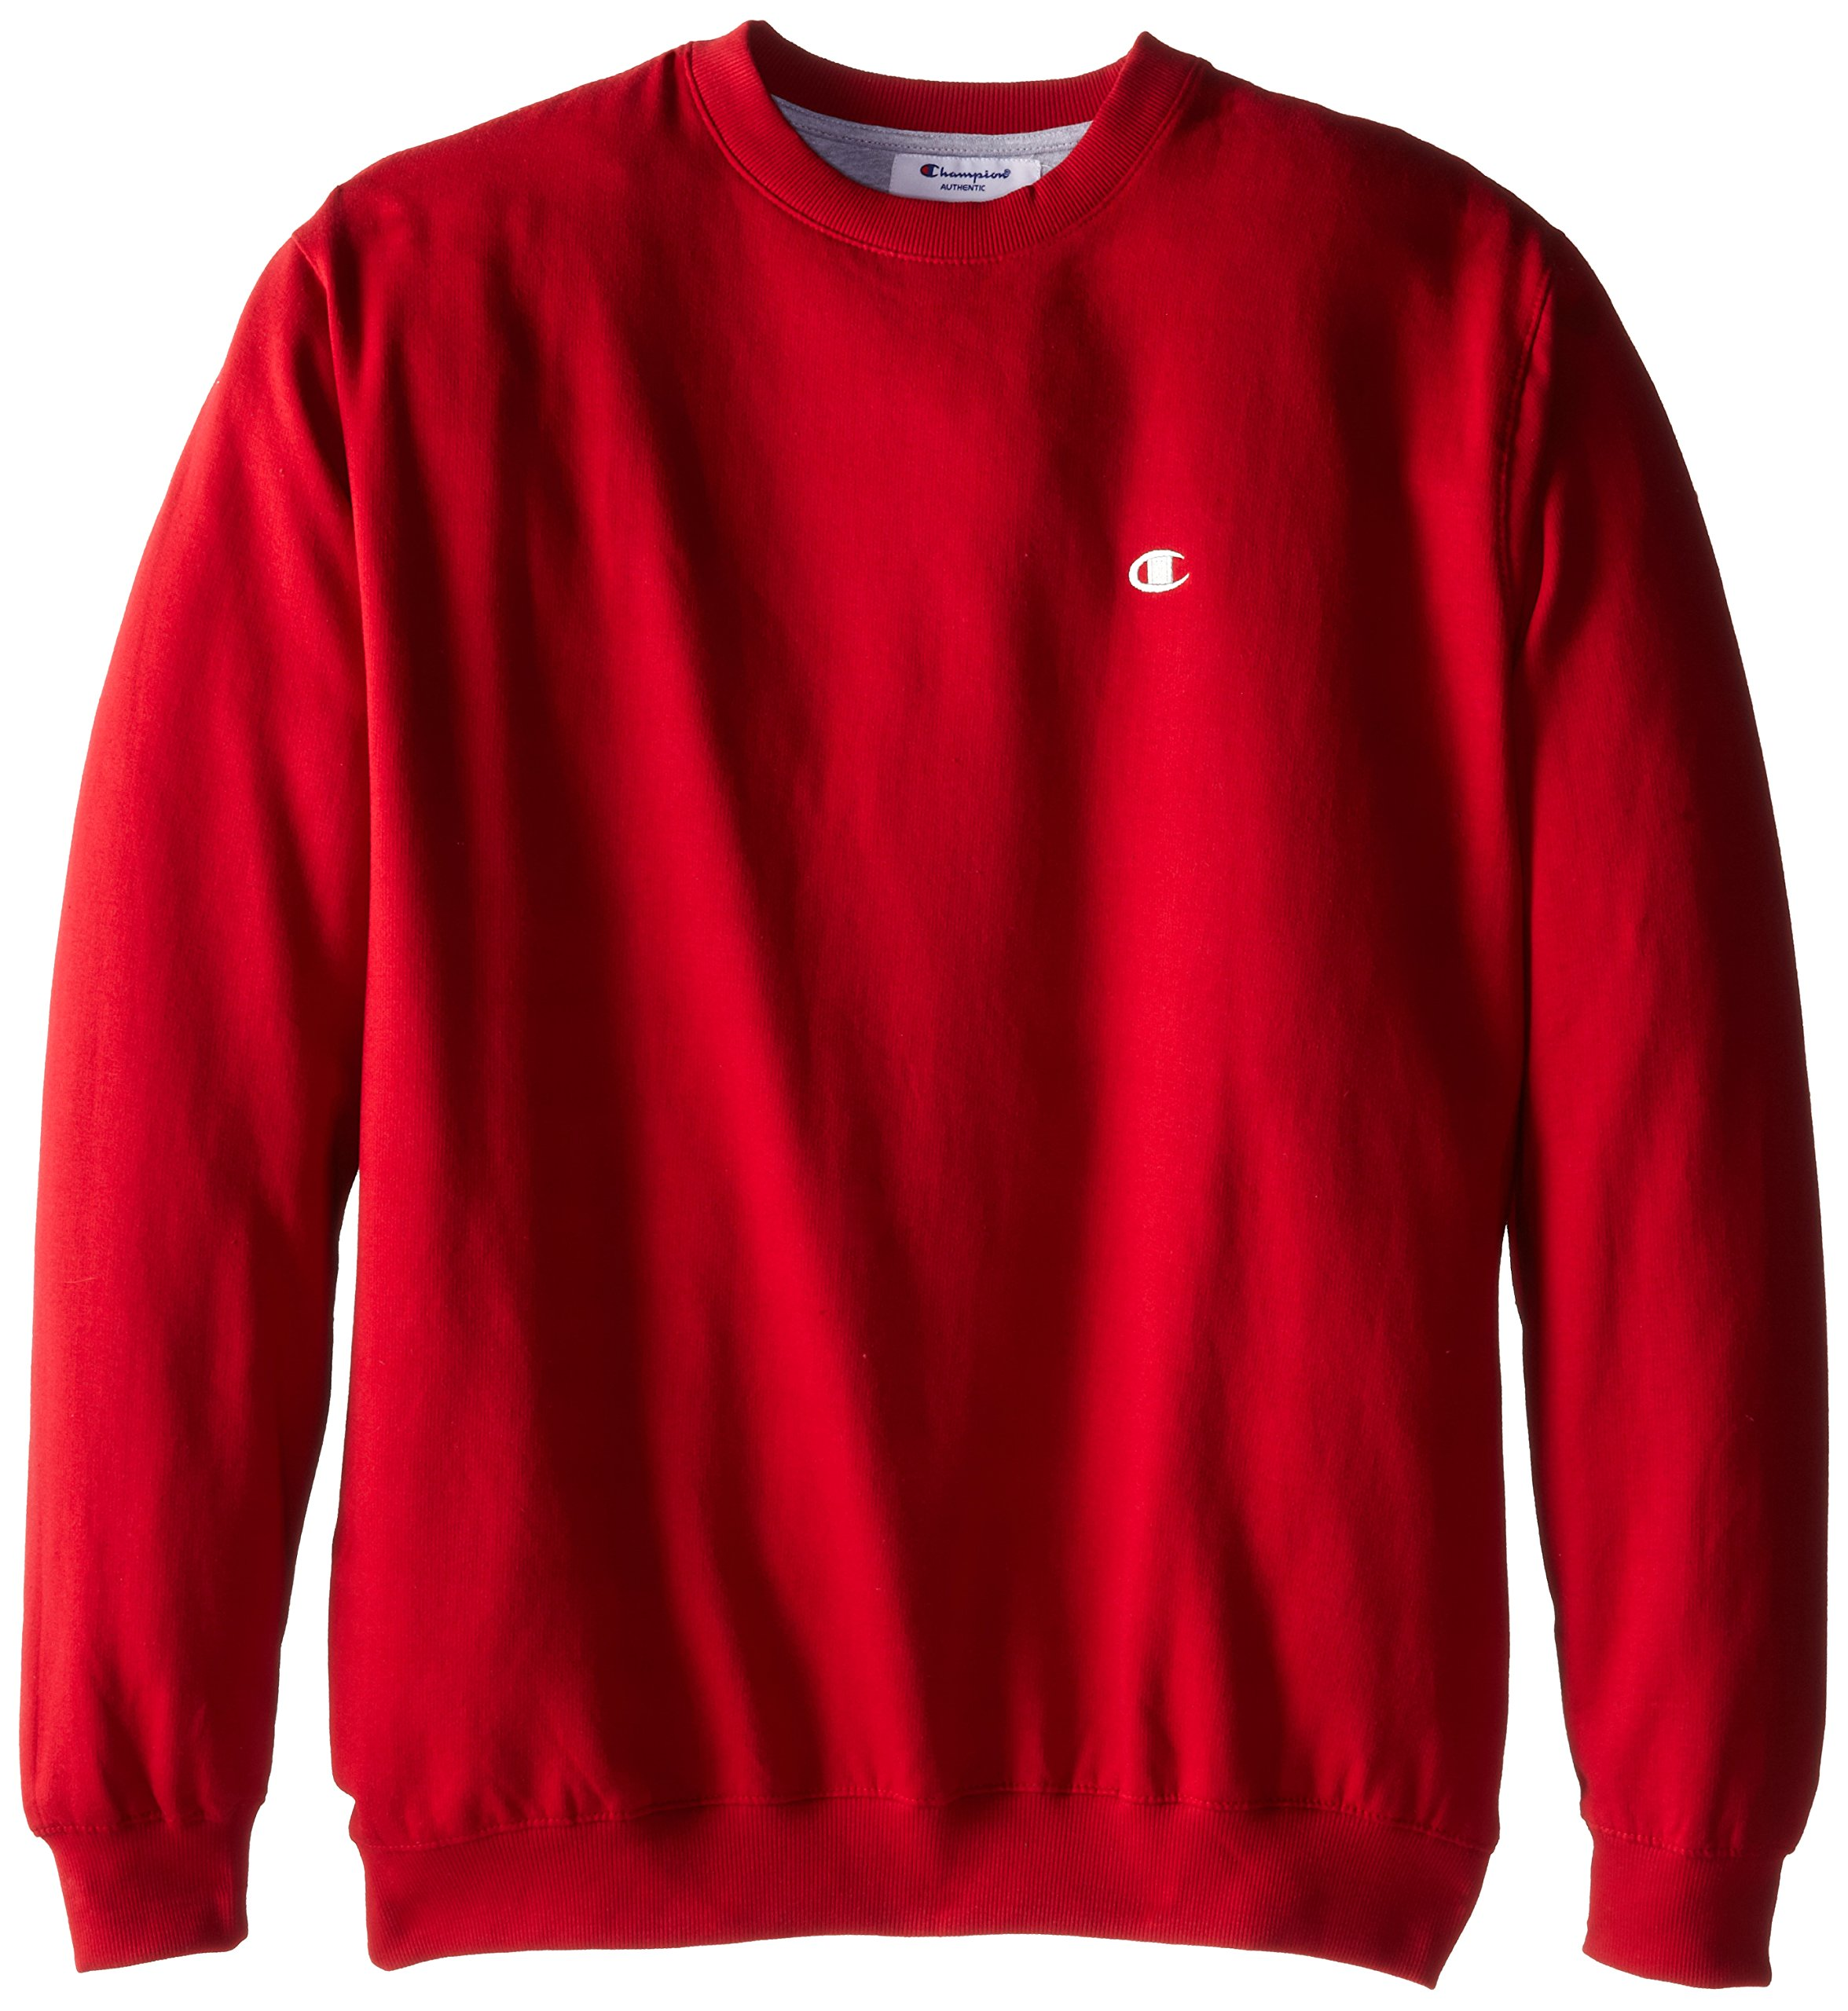 Champion Men's Big-Tall Fleece Crew Sweatshirt, Cardinal Red, 3X by Champion